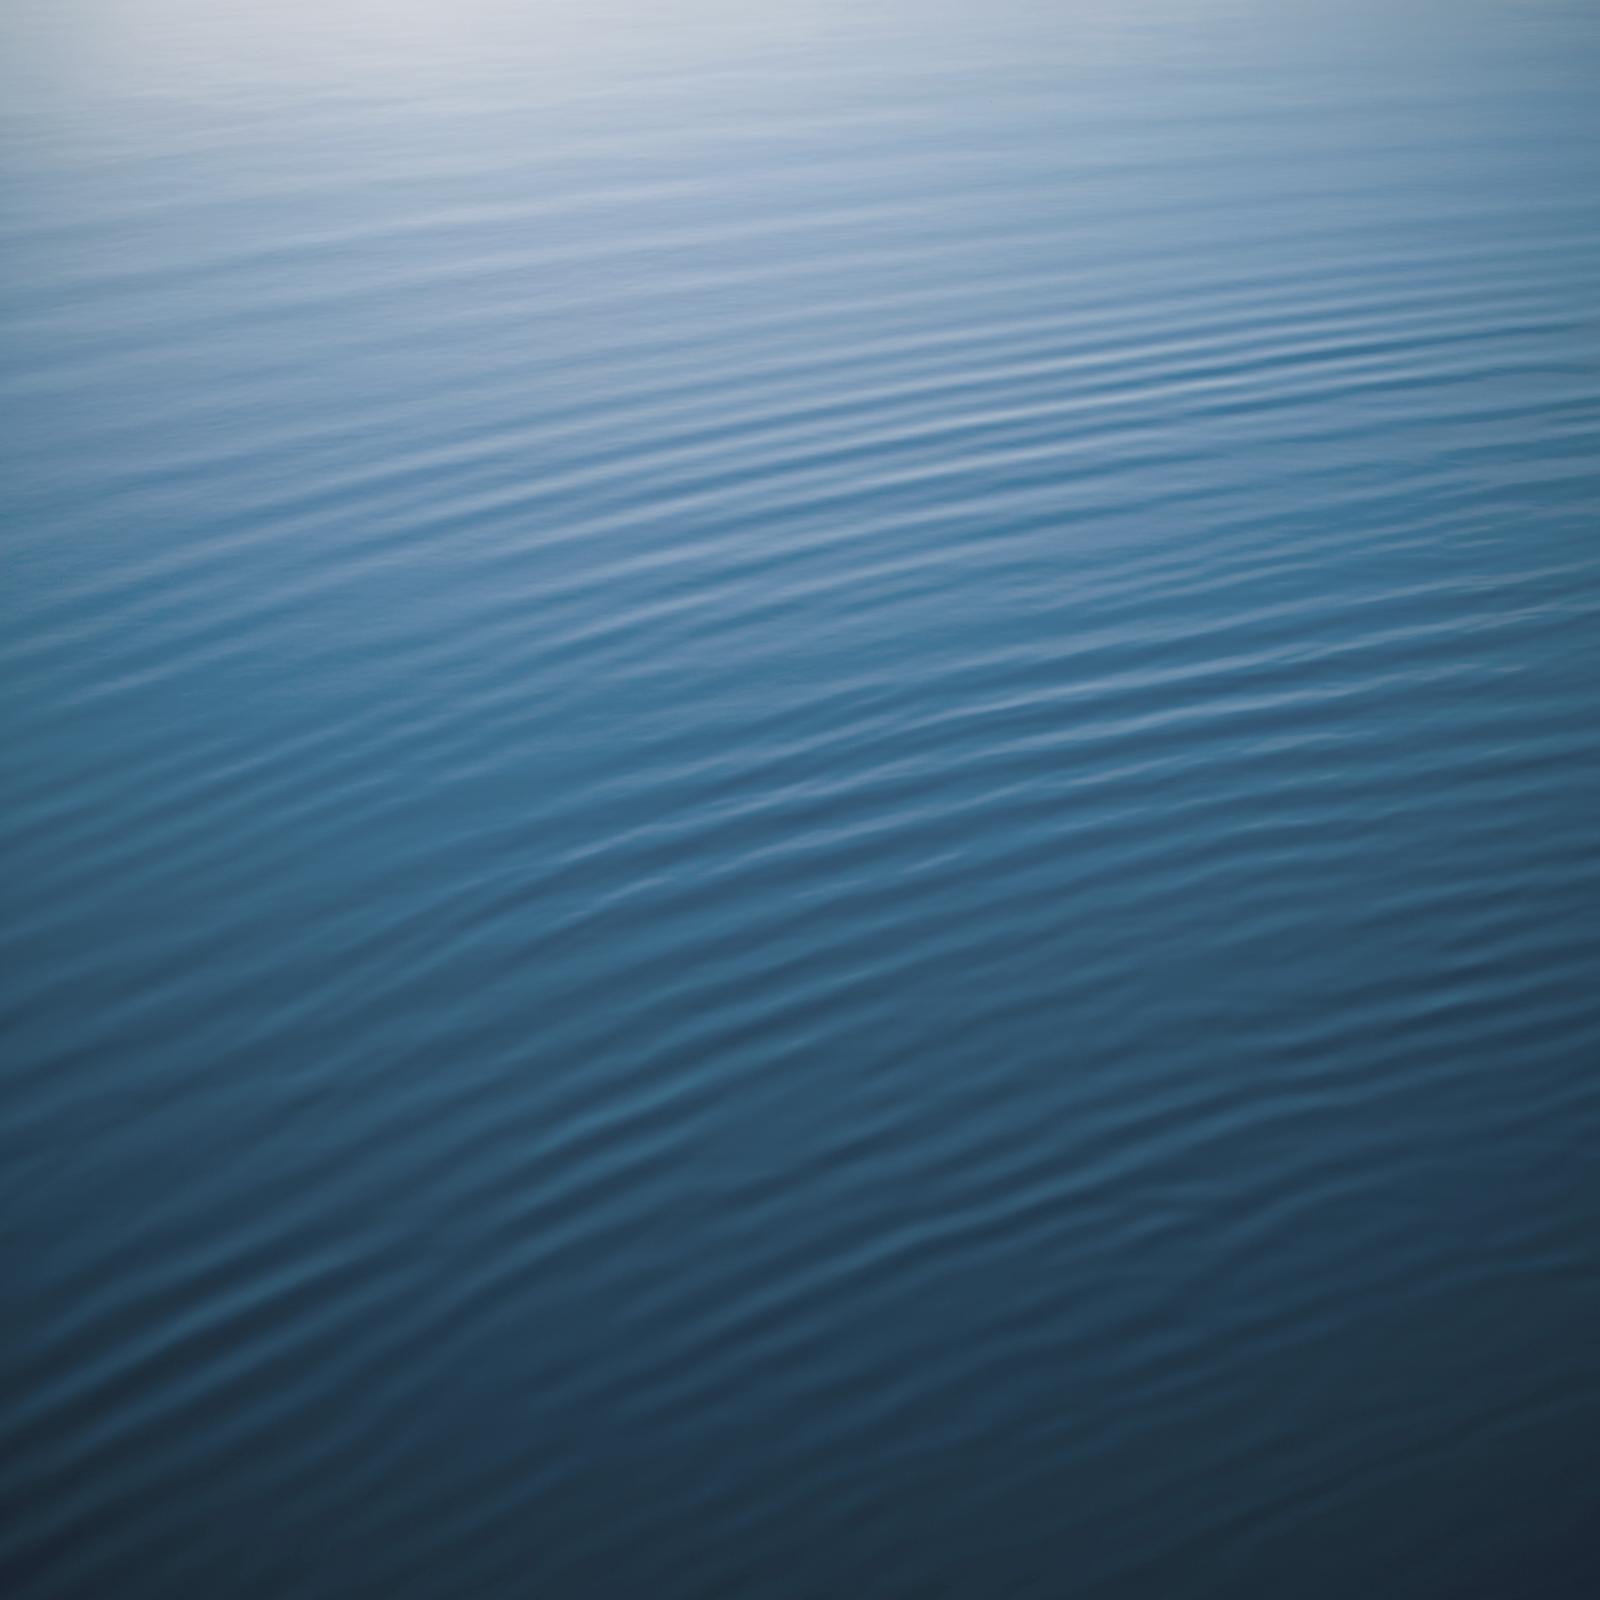 Wallpaper Iphone 4 Ios 5 Download Wallpaper DaWallpaperz 1600x1600